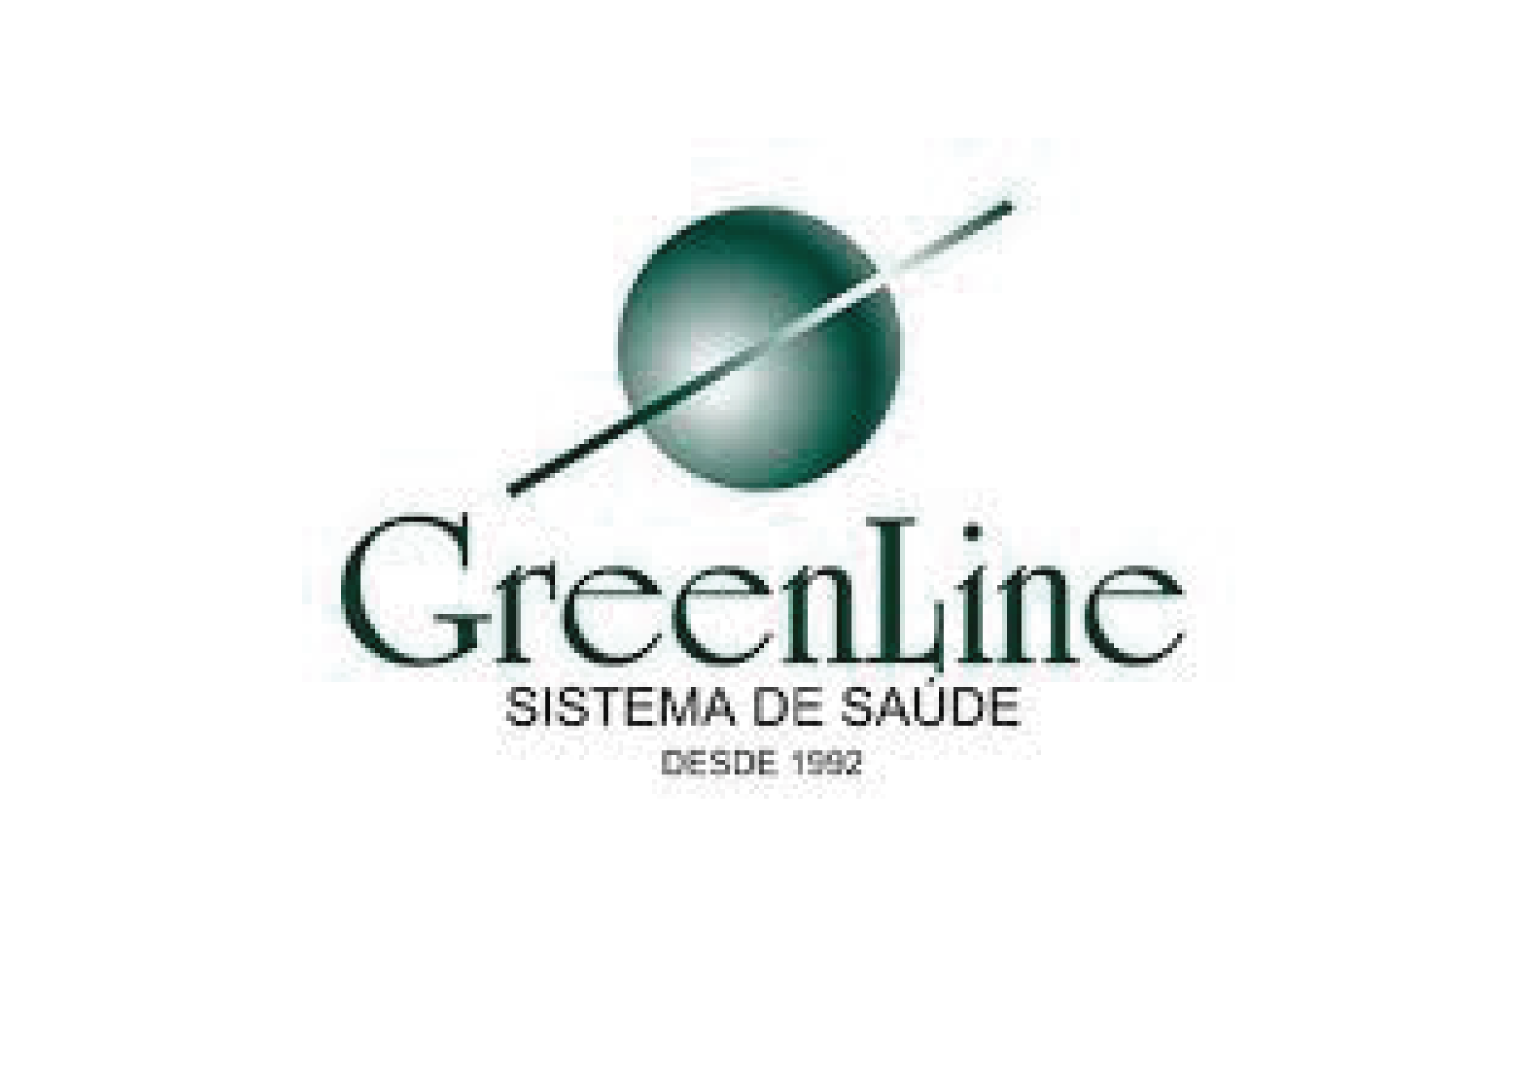 logo-greenline-corretora-de-seguros